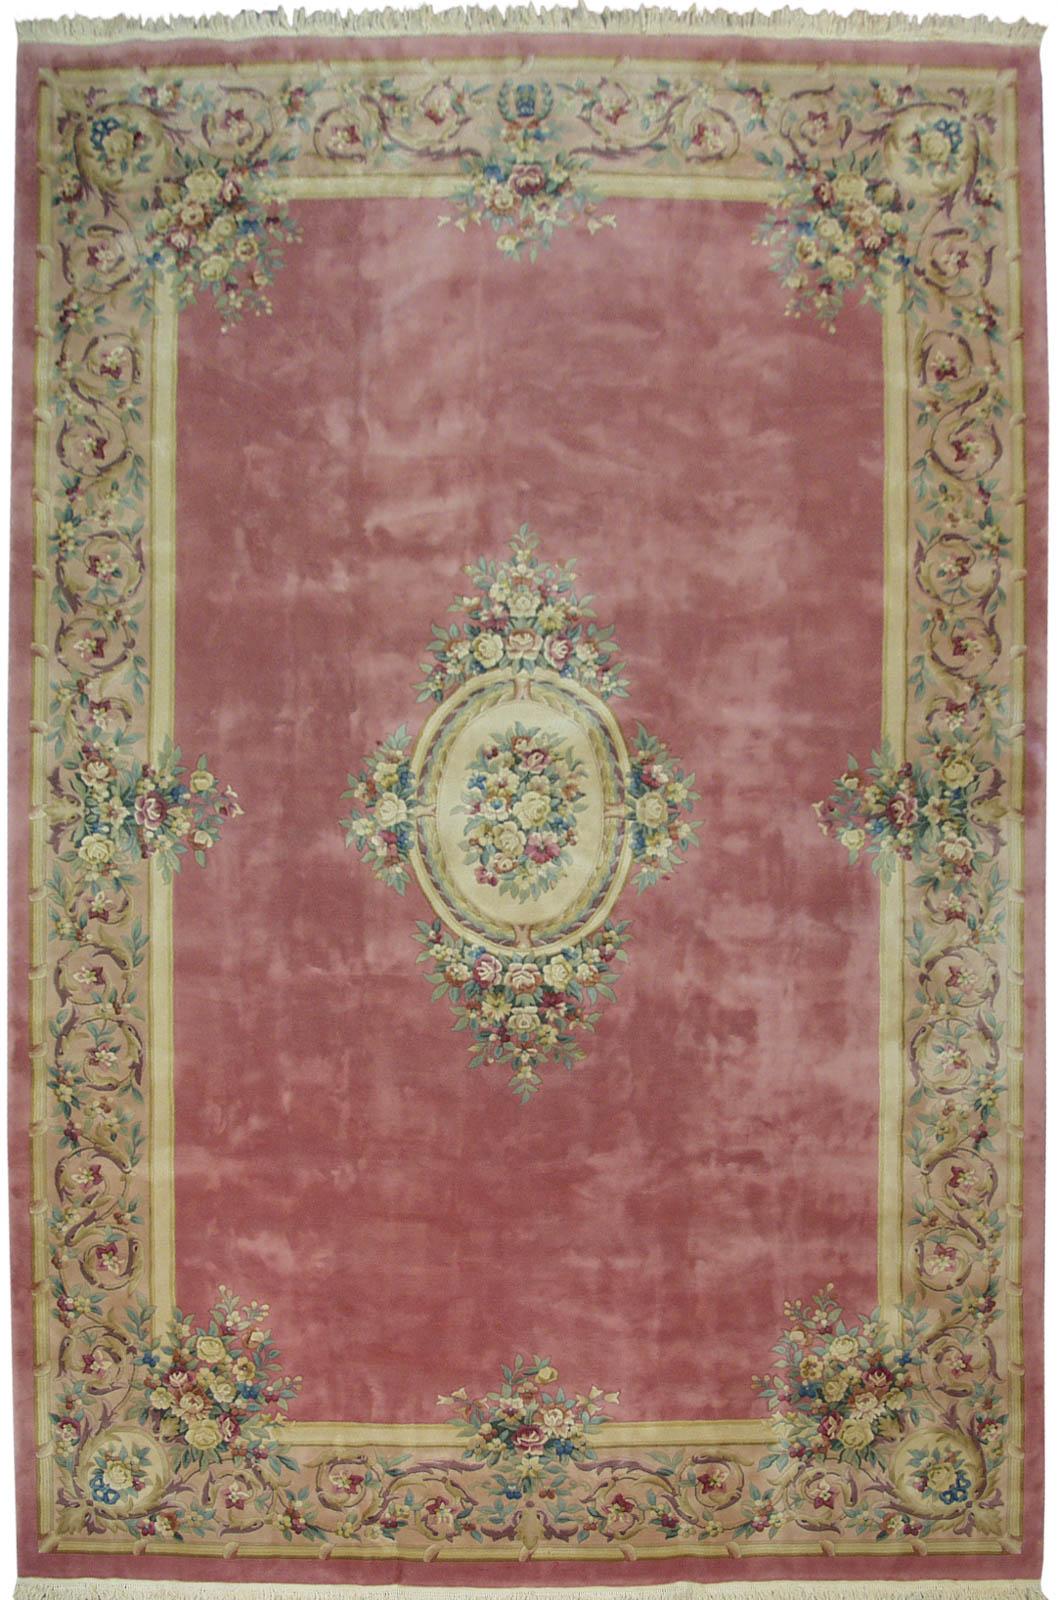 Rra 12x18 Pink Rose Aubusson Rug Carpet Floral 29737 Ebay